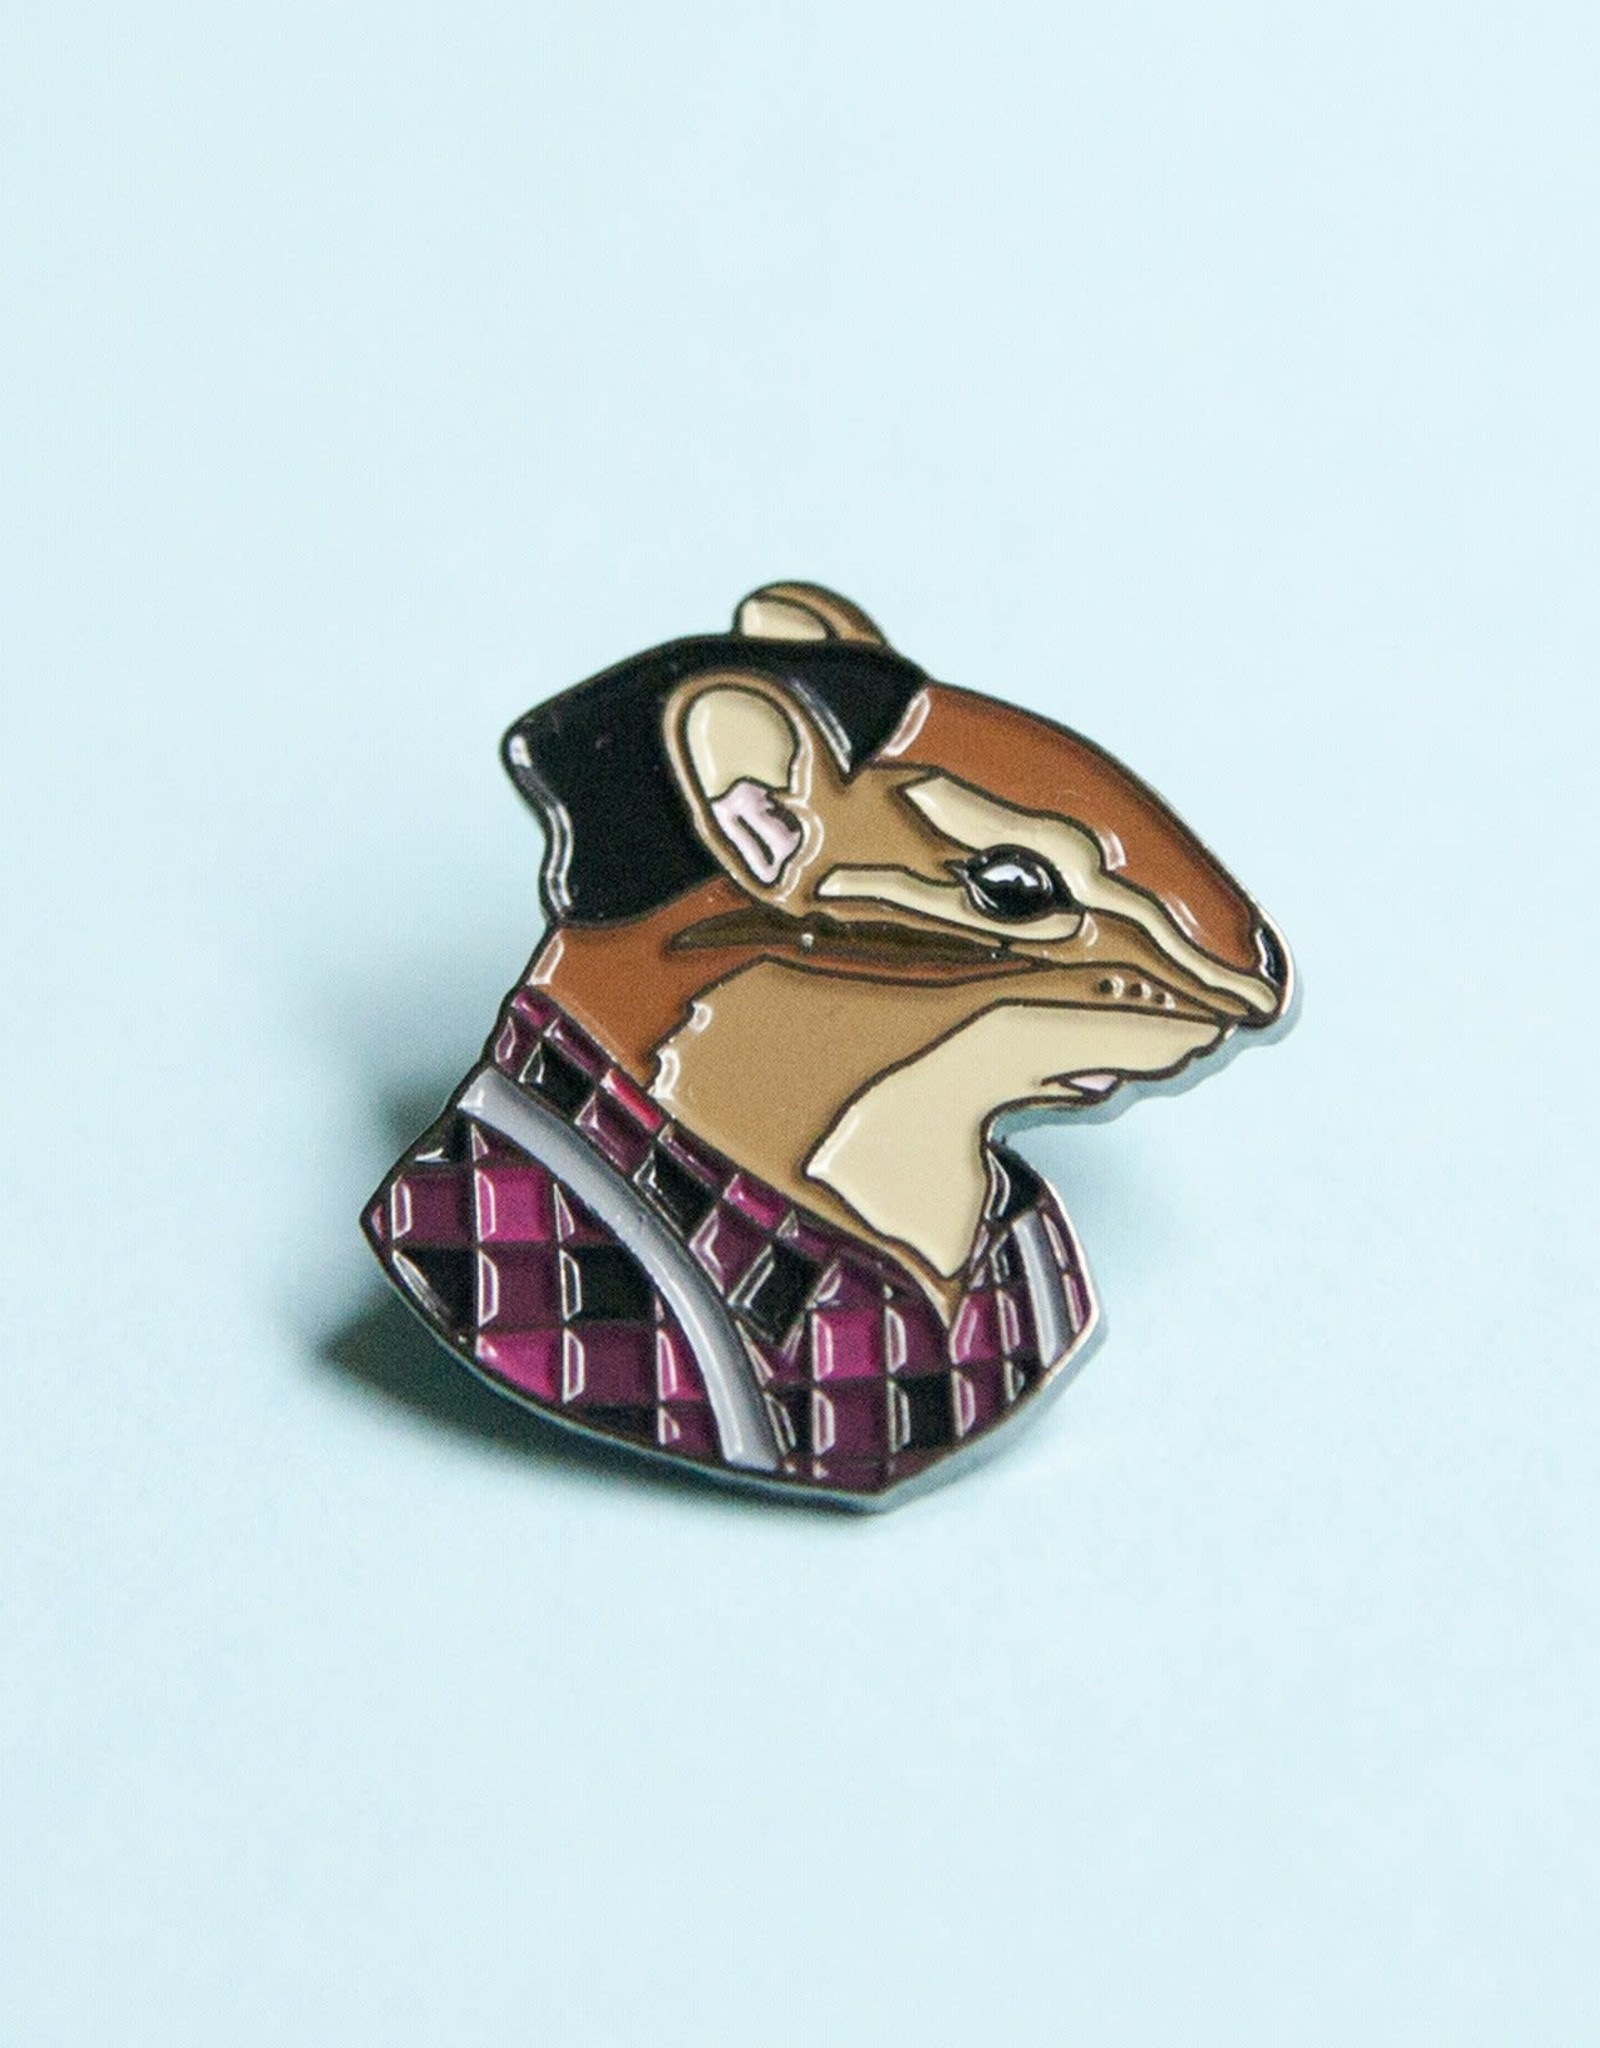 Berkley Illustration ''Chipmunk Fellow'' Animal Portrait Enamel Pin - Ryan Berkley